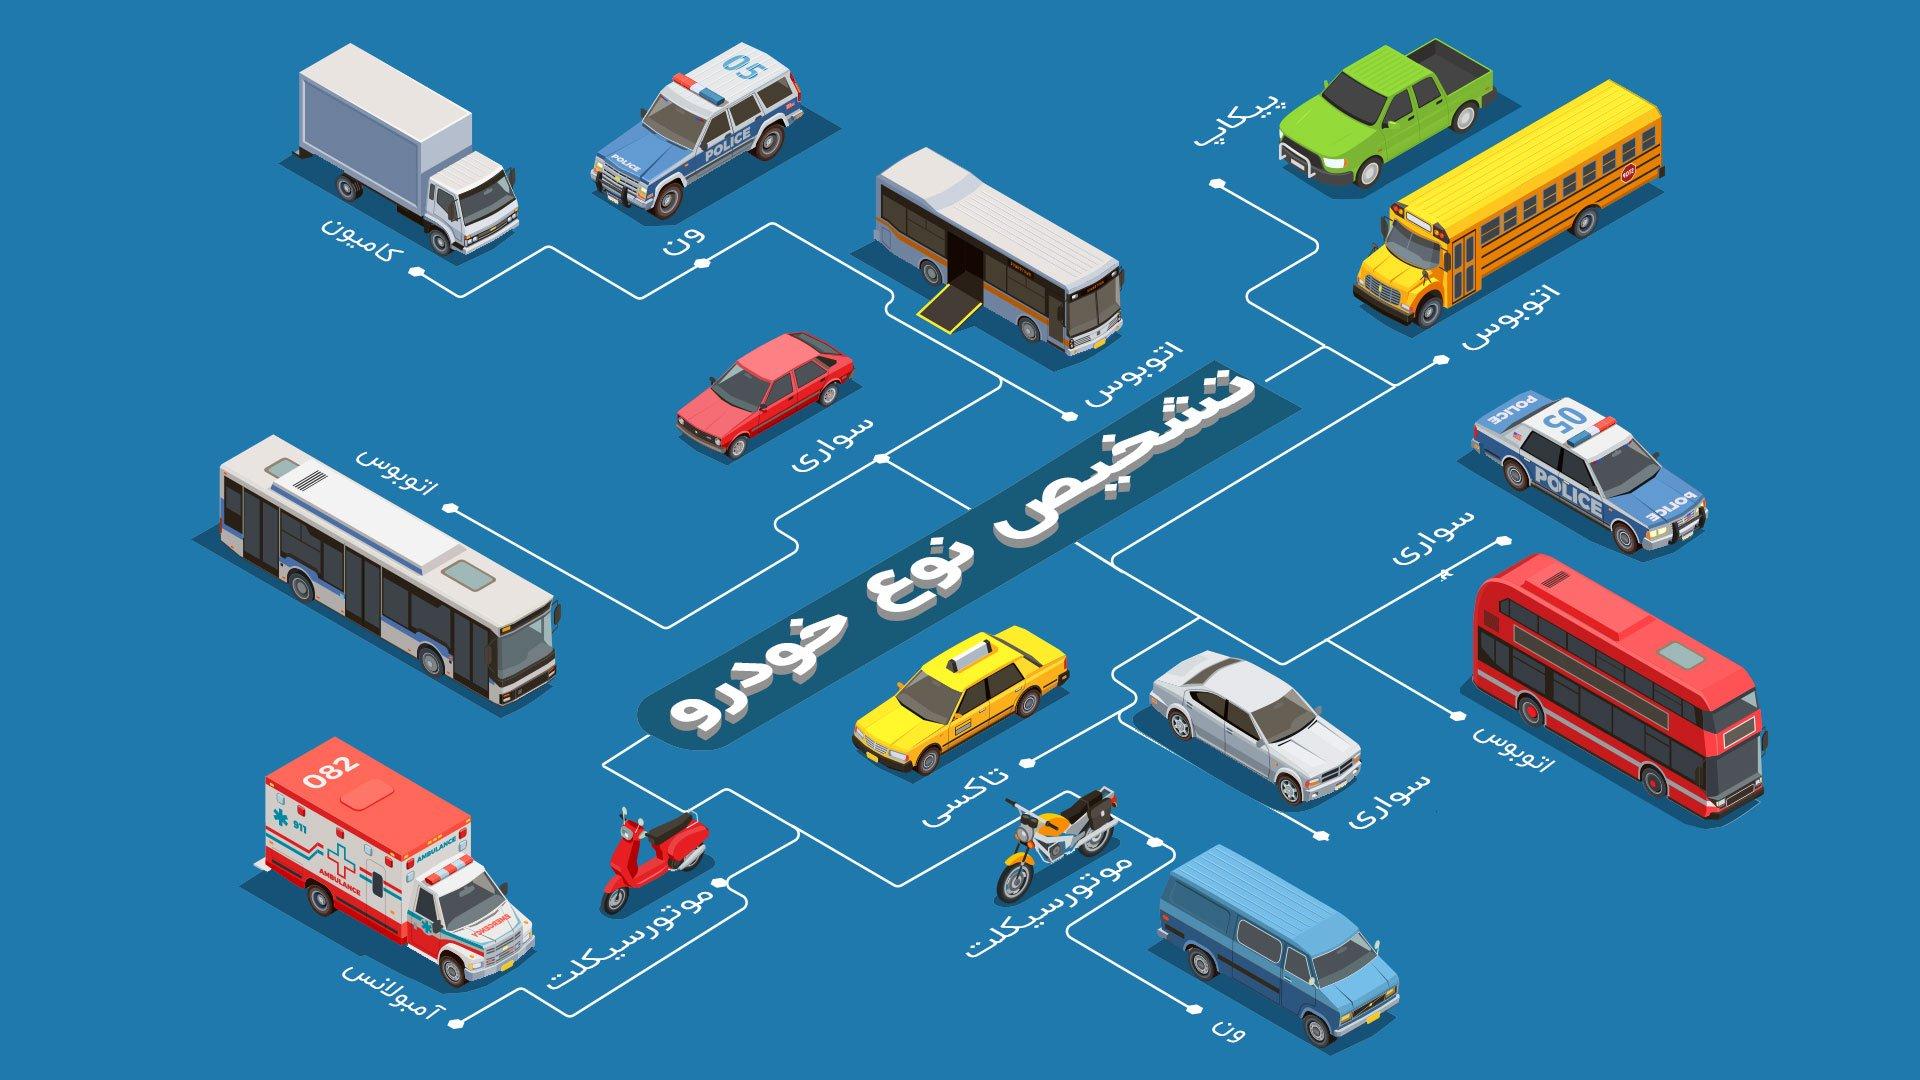 ماژول تشخیص نوع خودرو - vehicle classification sdk in c++ and c#